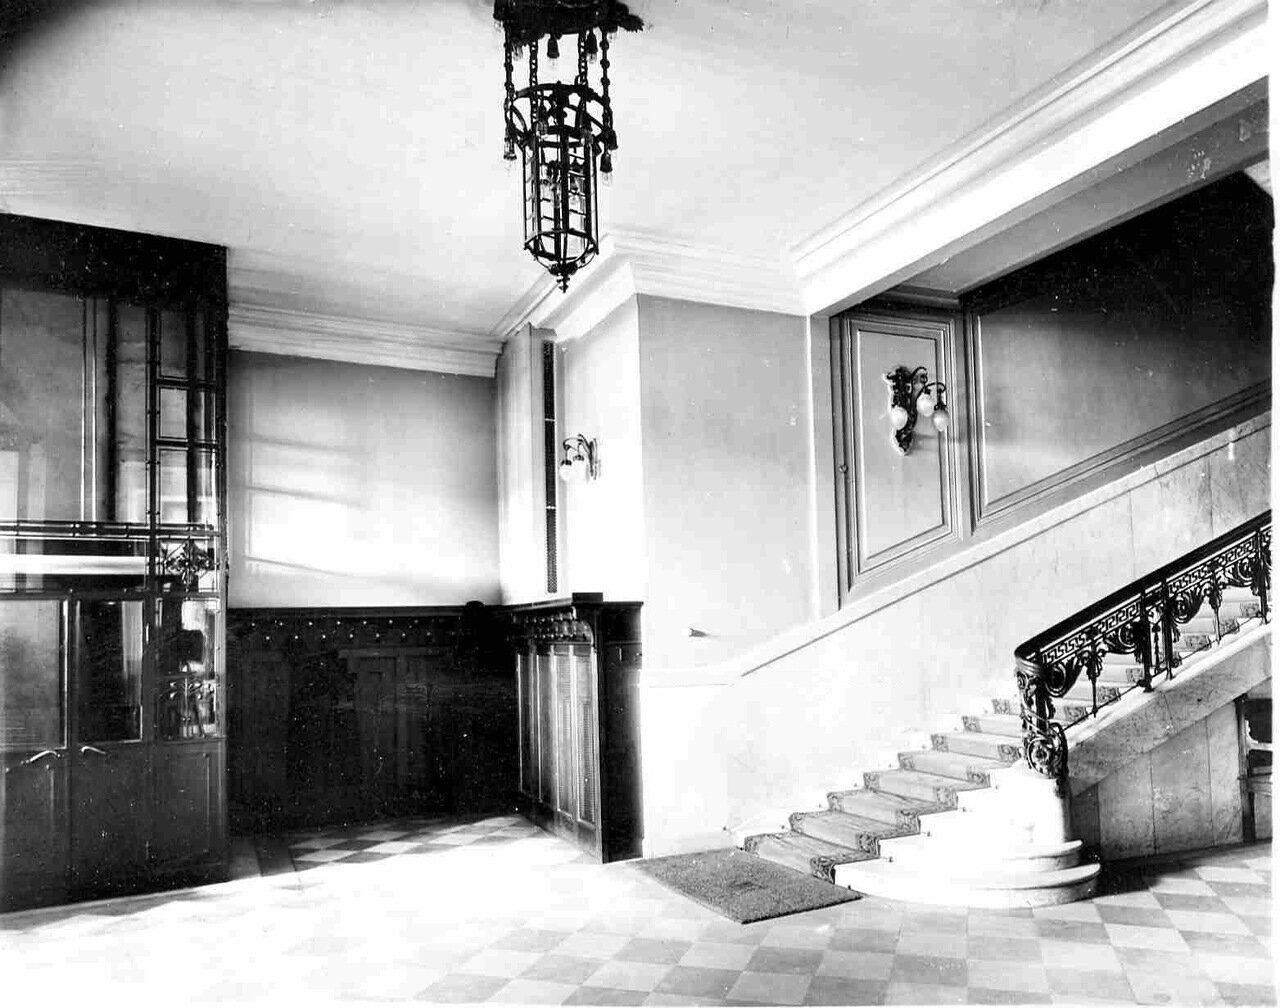 03. Вестибюль. Лестница